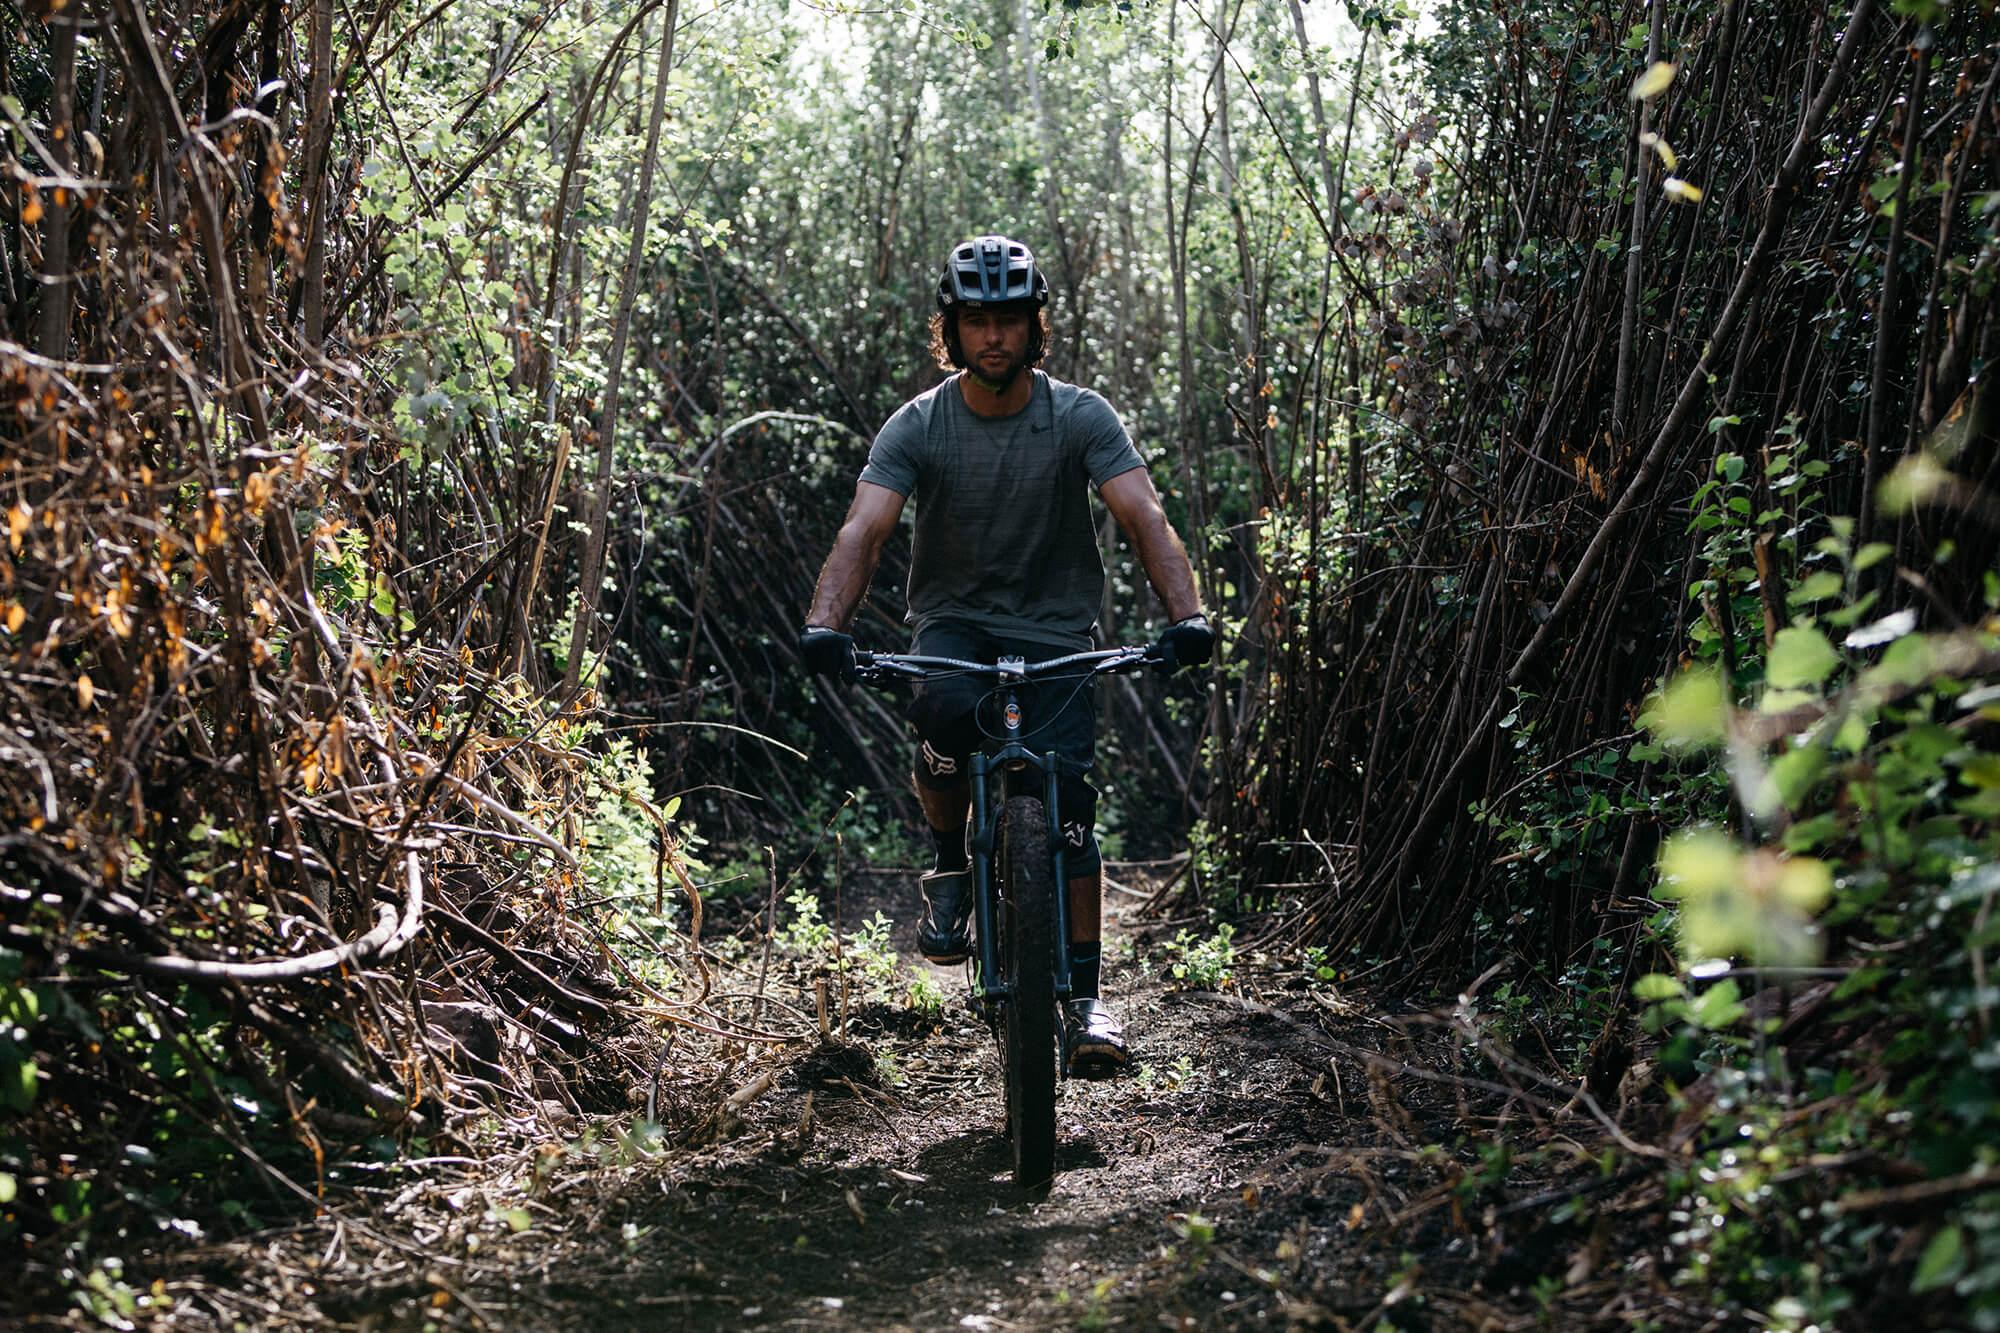 Green Single Track Trail